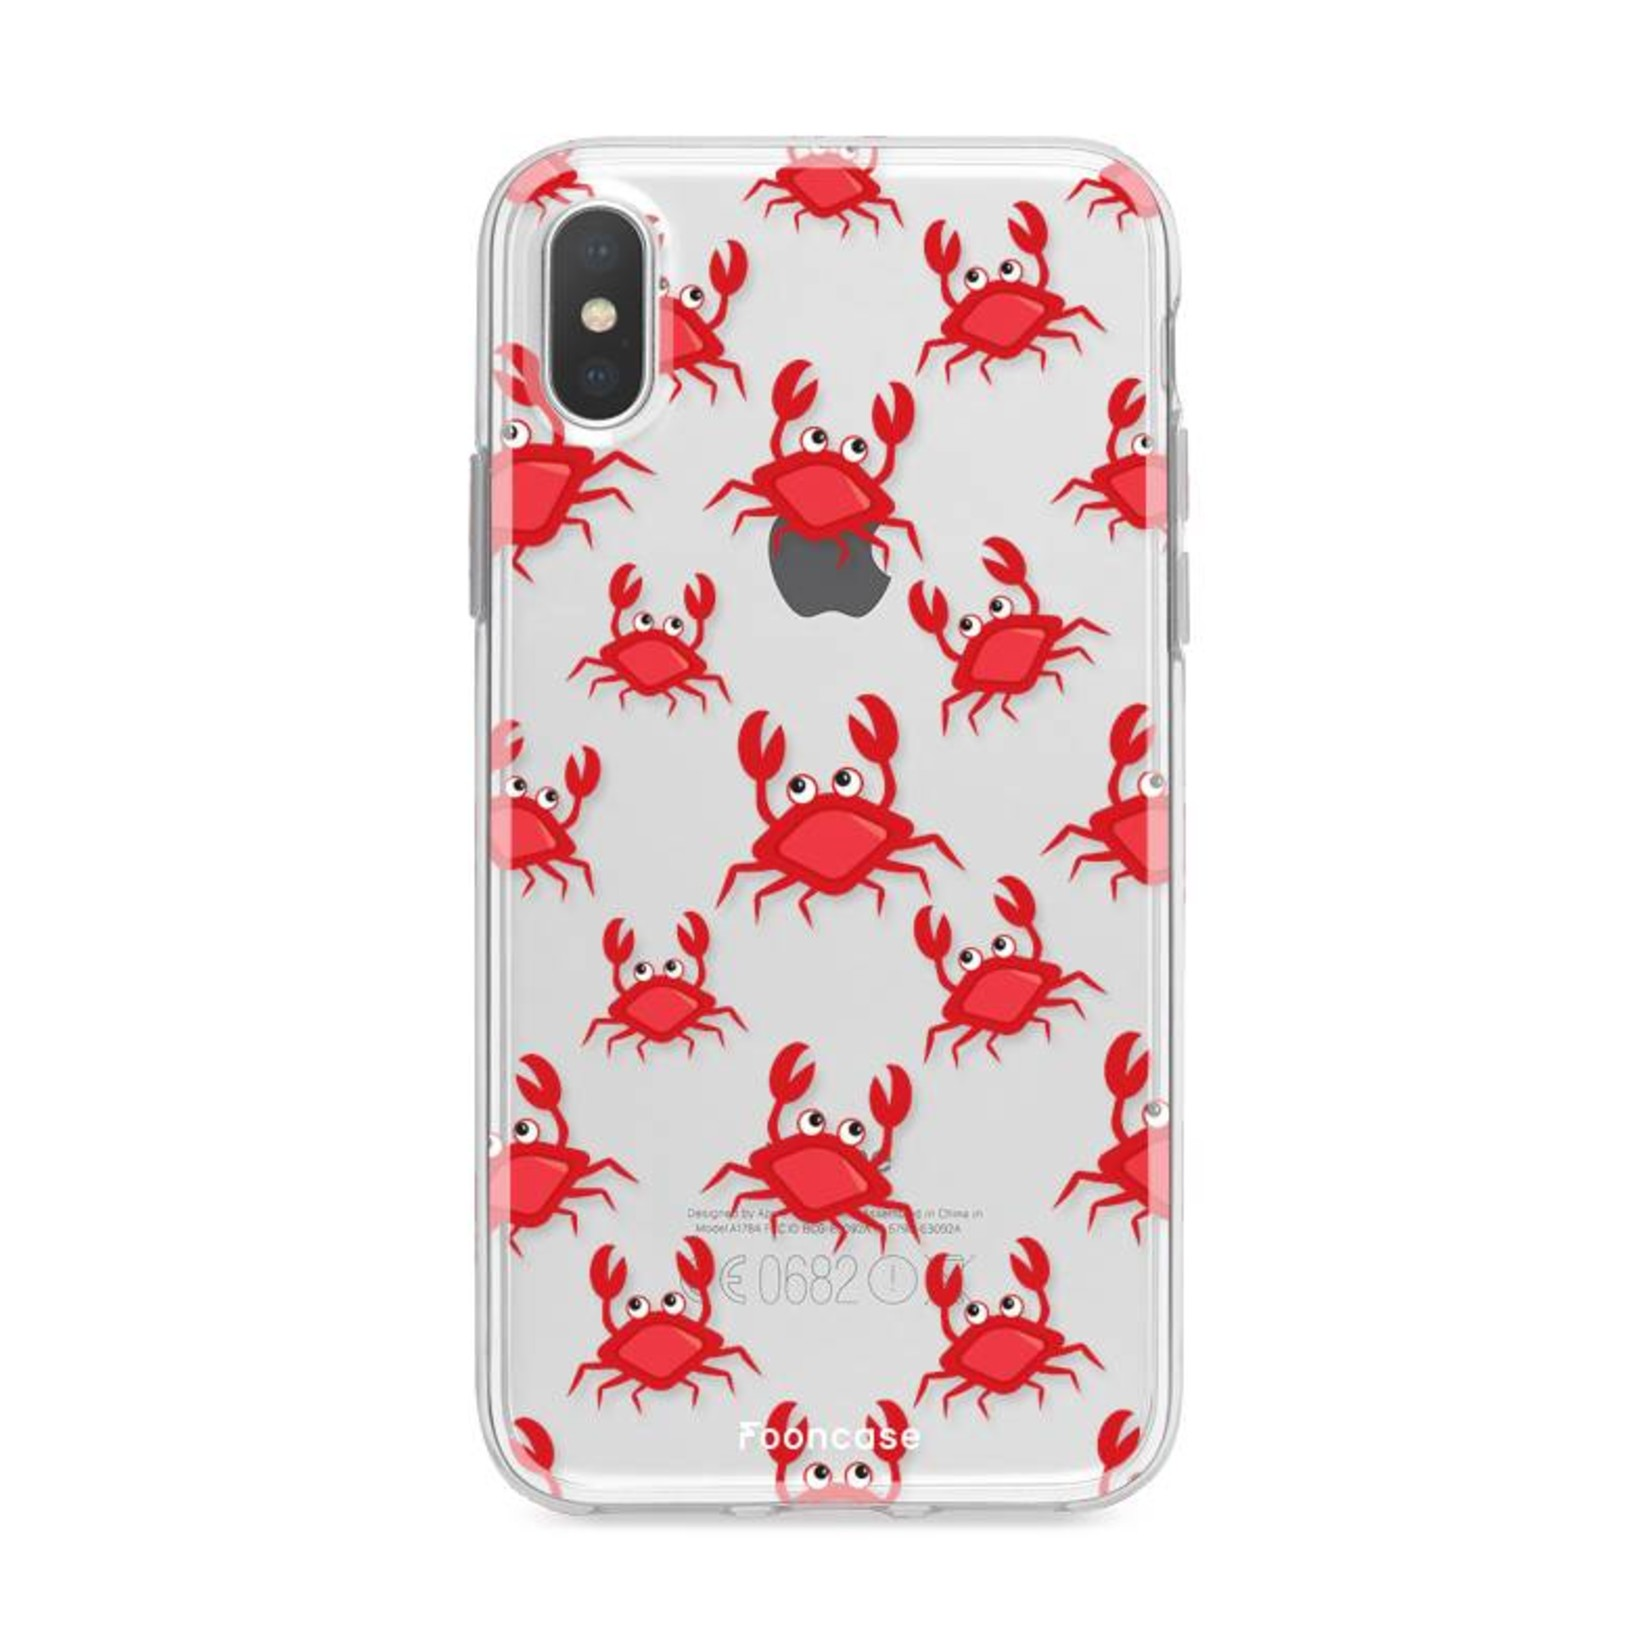 FOONCASE Iphone X Handyhülle - Krabben